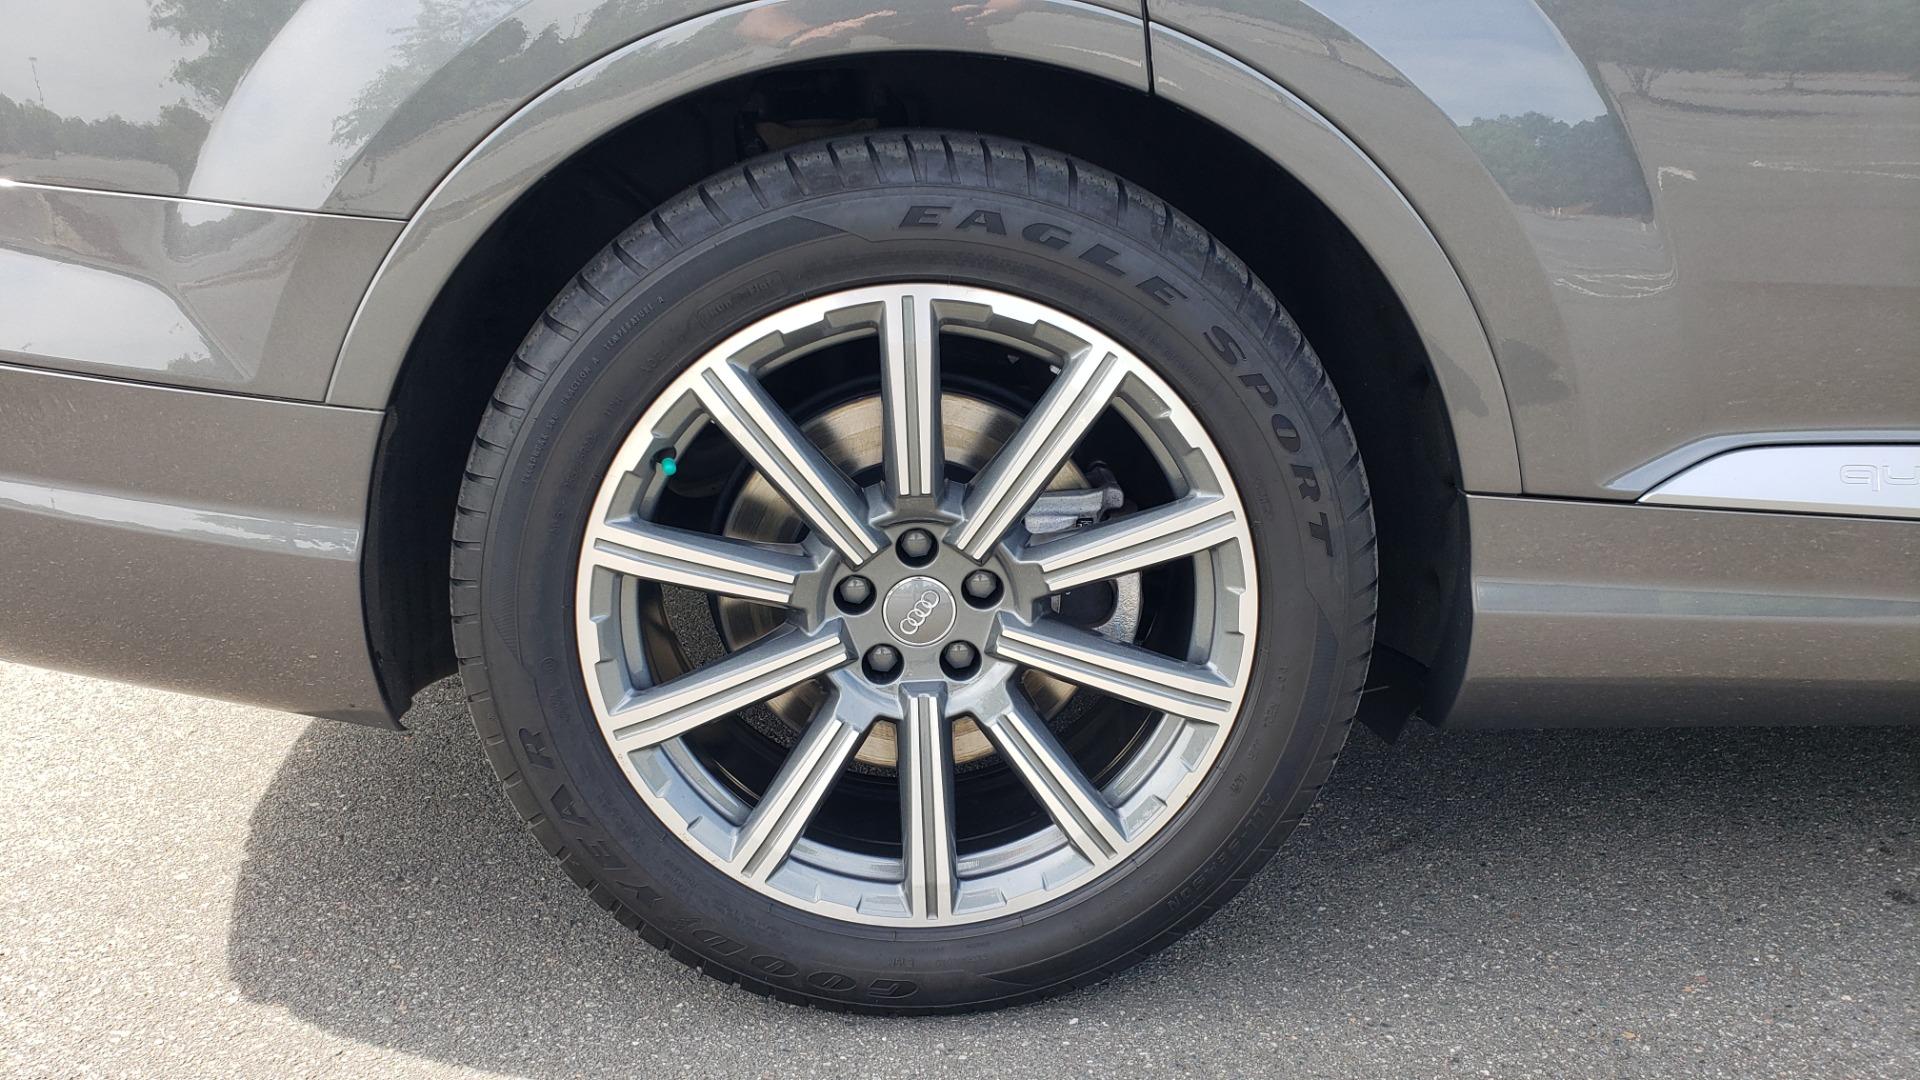 Used 2018 Audi Q7 PRESTIGE TIPTRONIC / NAV / SUNROOF / ADAPTIVE PKG / DRVR ASST / CLD WTHR /  for sale $49,995 at Formula Imports in Charlotte NC 28227 92